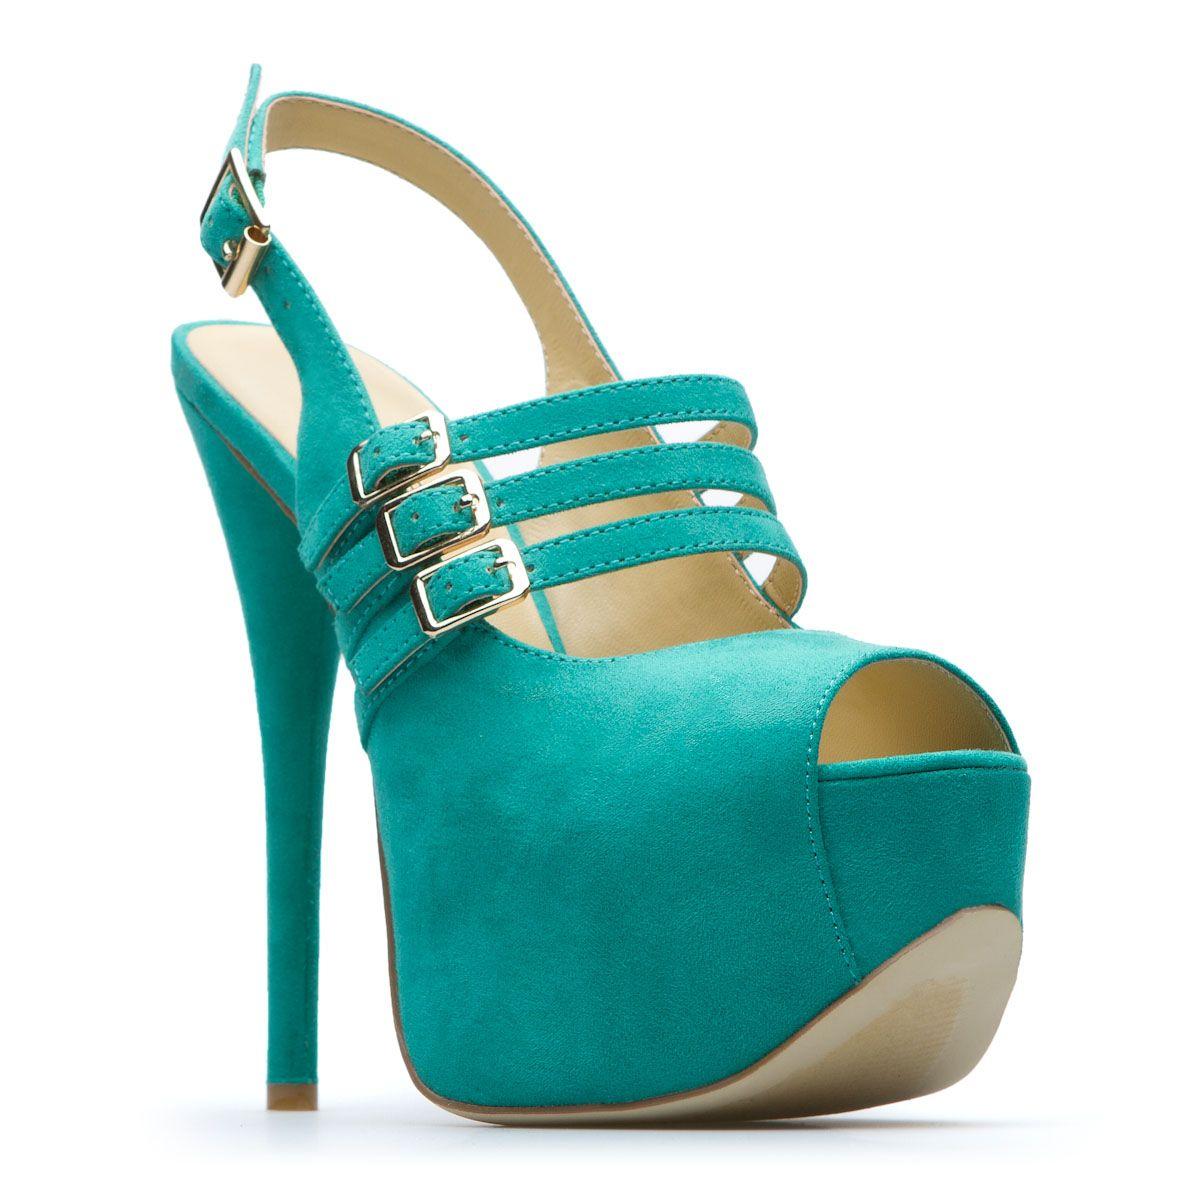 a856c3eedf0 Caresse Heel - A new take on the Mary Jane | fashion | Shoes, Shoe ...